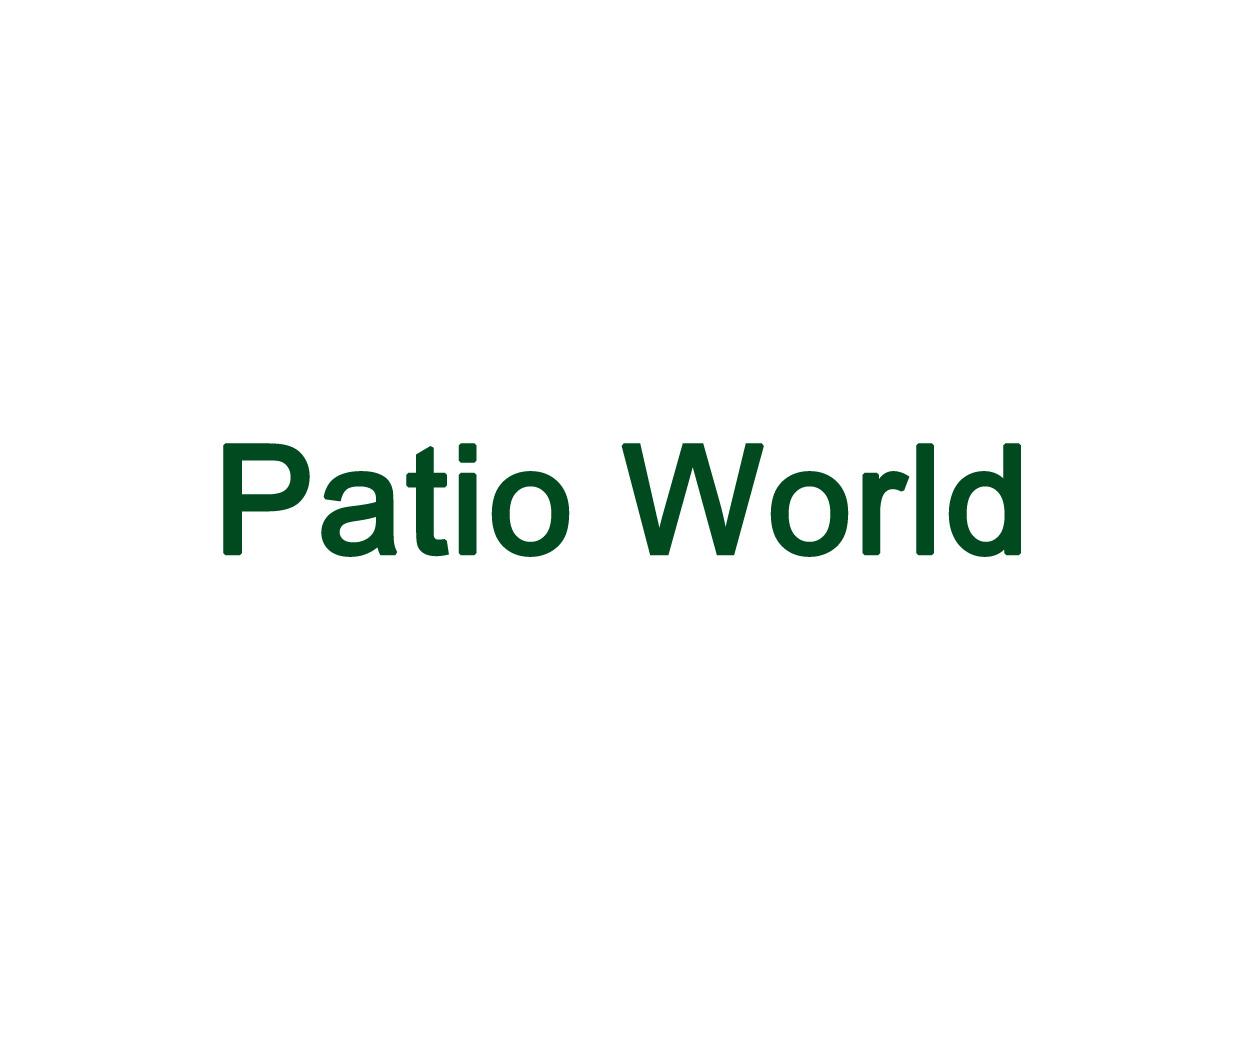 Patio World